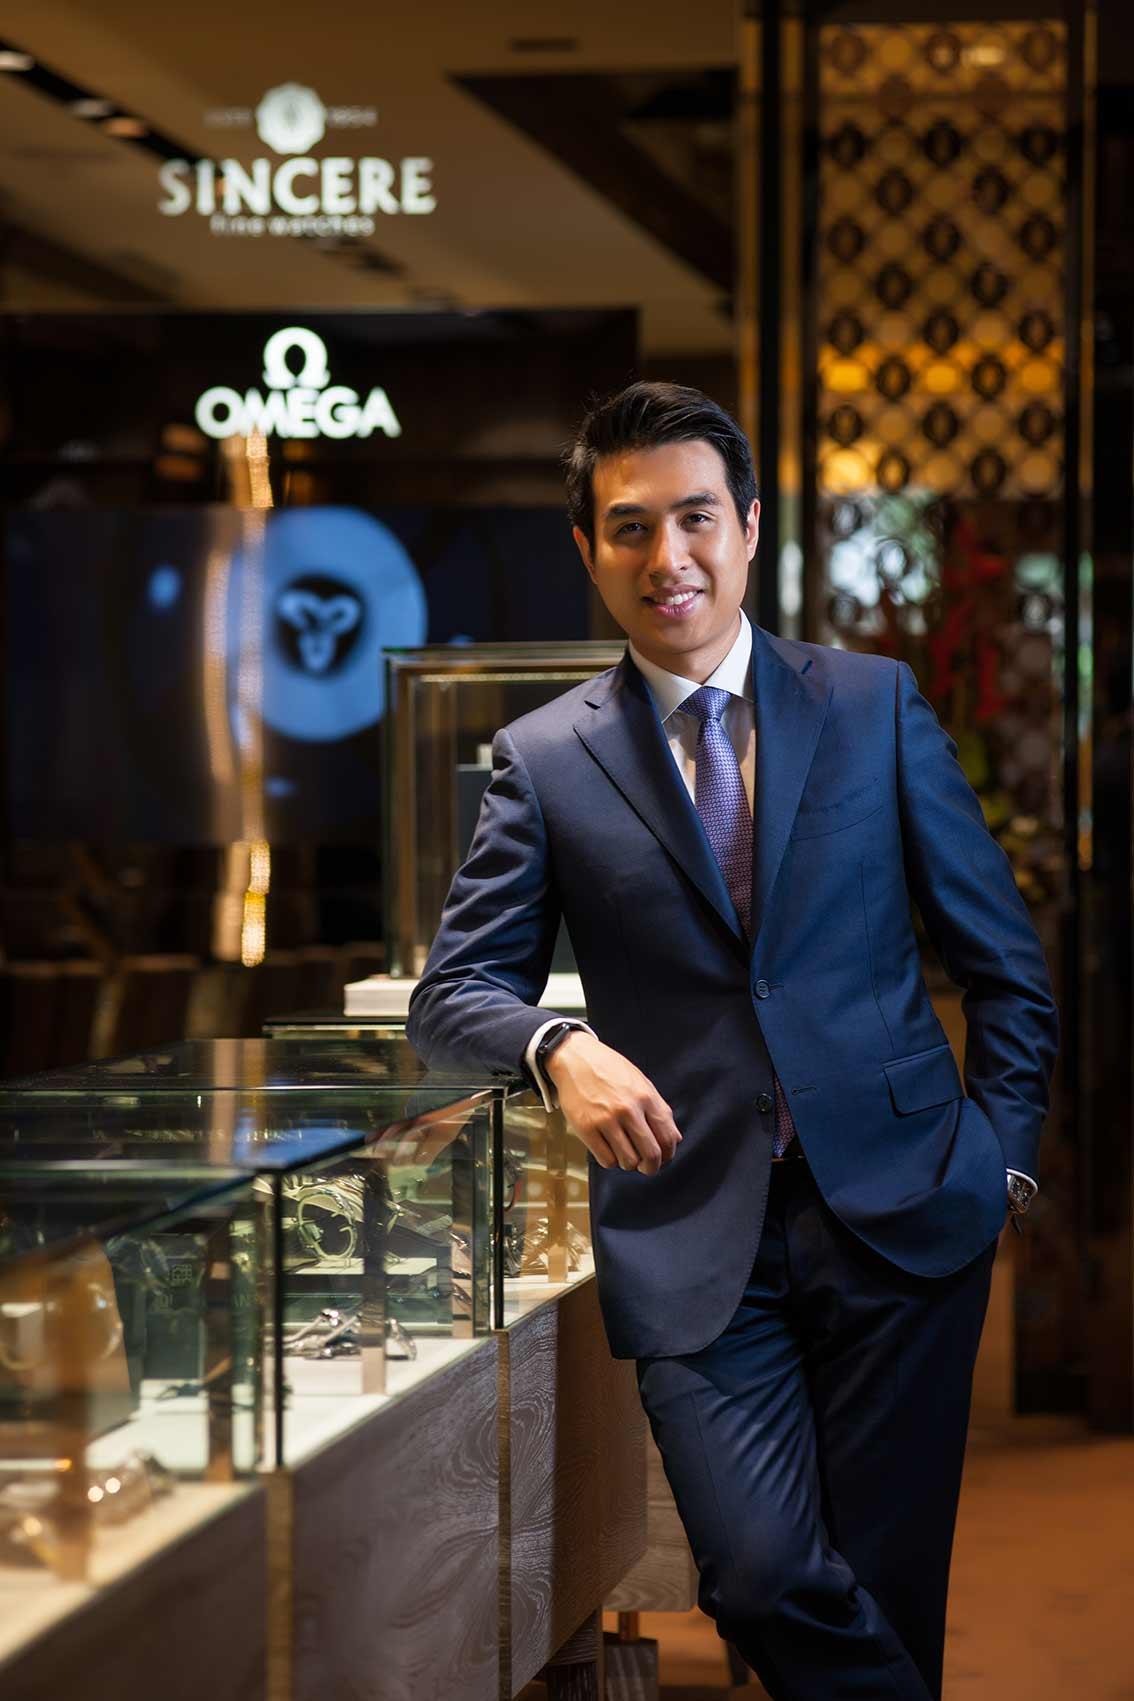 Kingston Chu, Sincere Watch, Portrait in Singapore